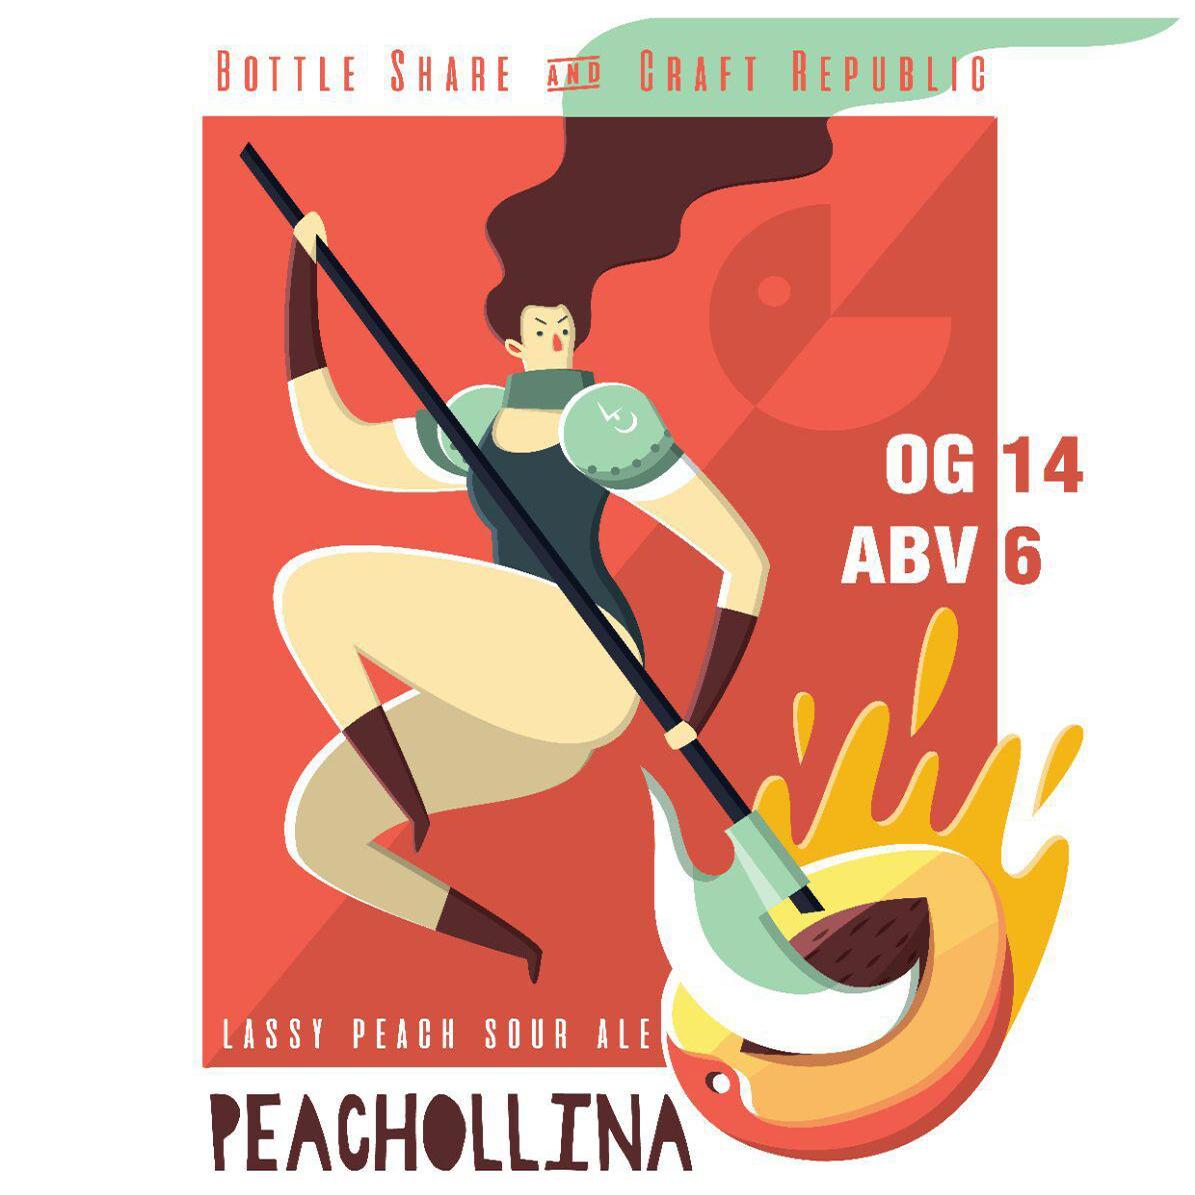 https://static-eu.insales.ru/images/products/1/2146/255625314/bottle-share-peachollina.jpg